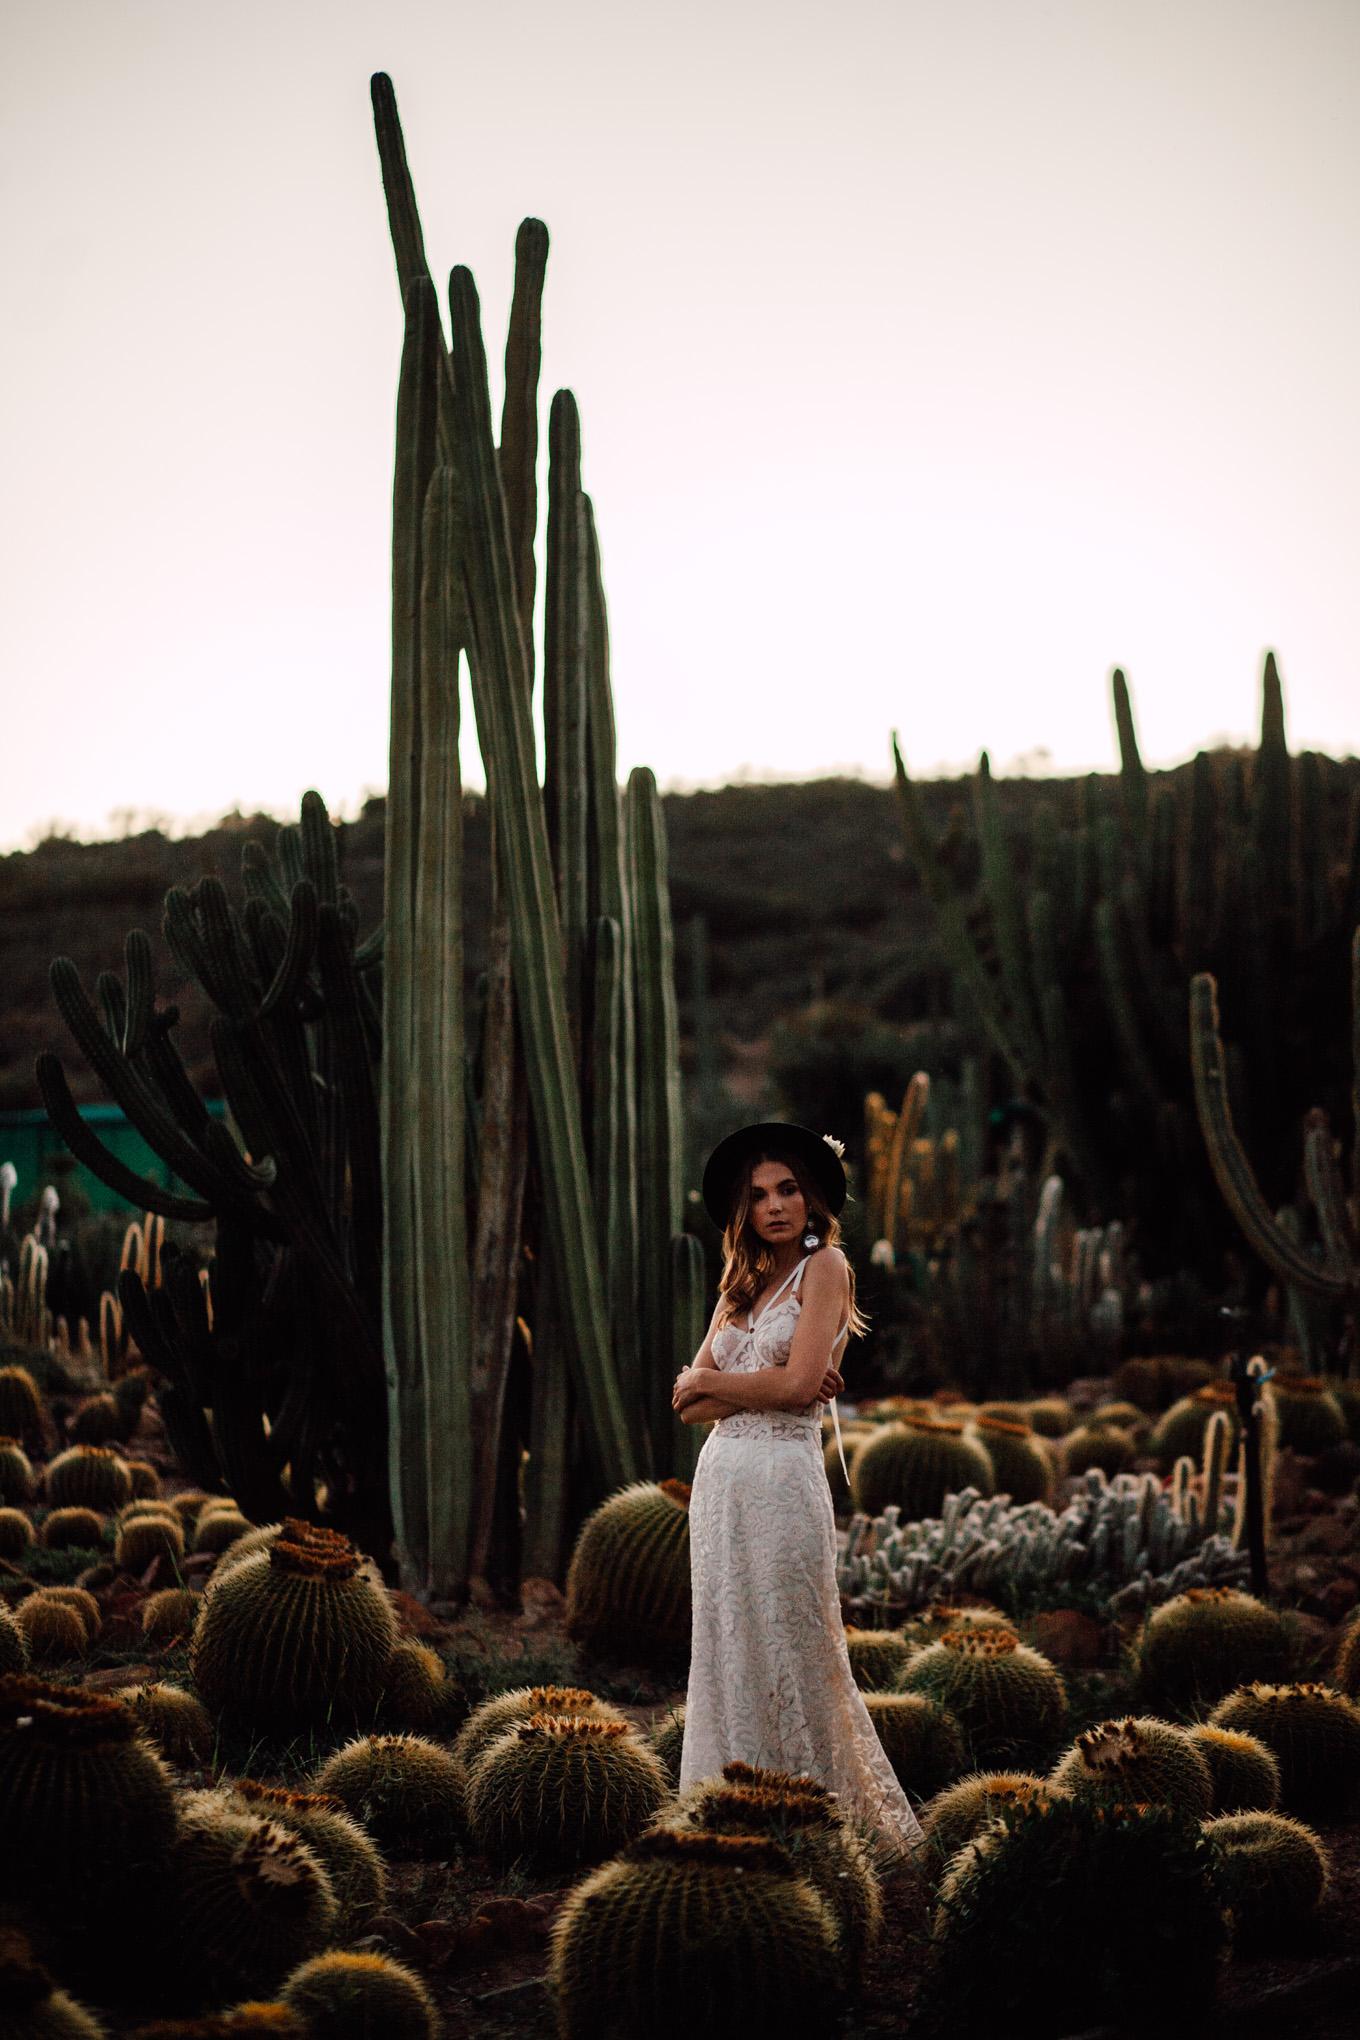 Cape-Town-Pia-Anna-Christian-Wedding-Photography-South-Africa-Bride-Cactus-42.jpg